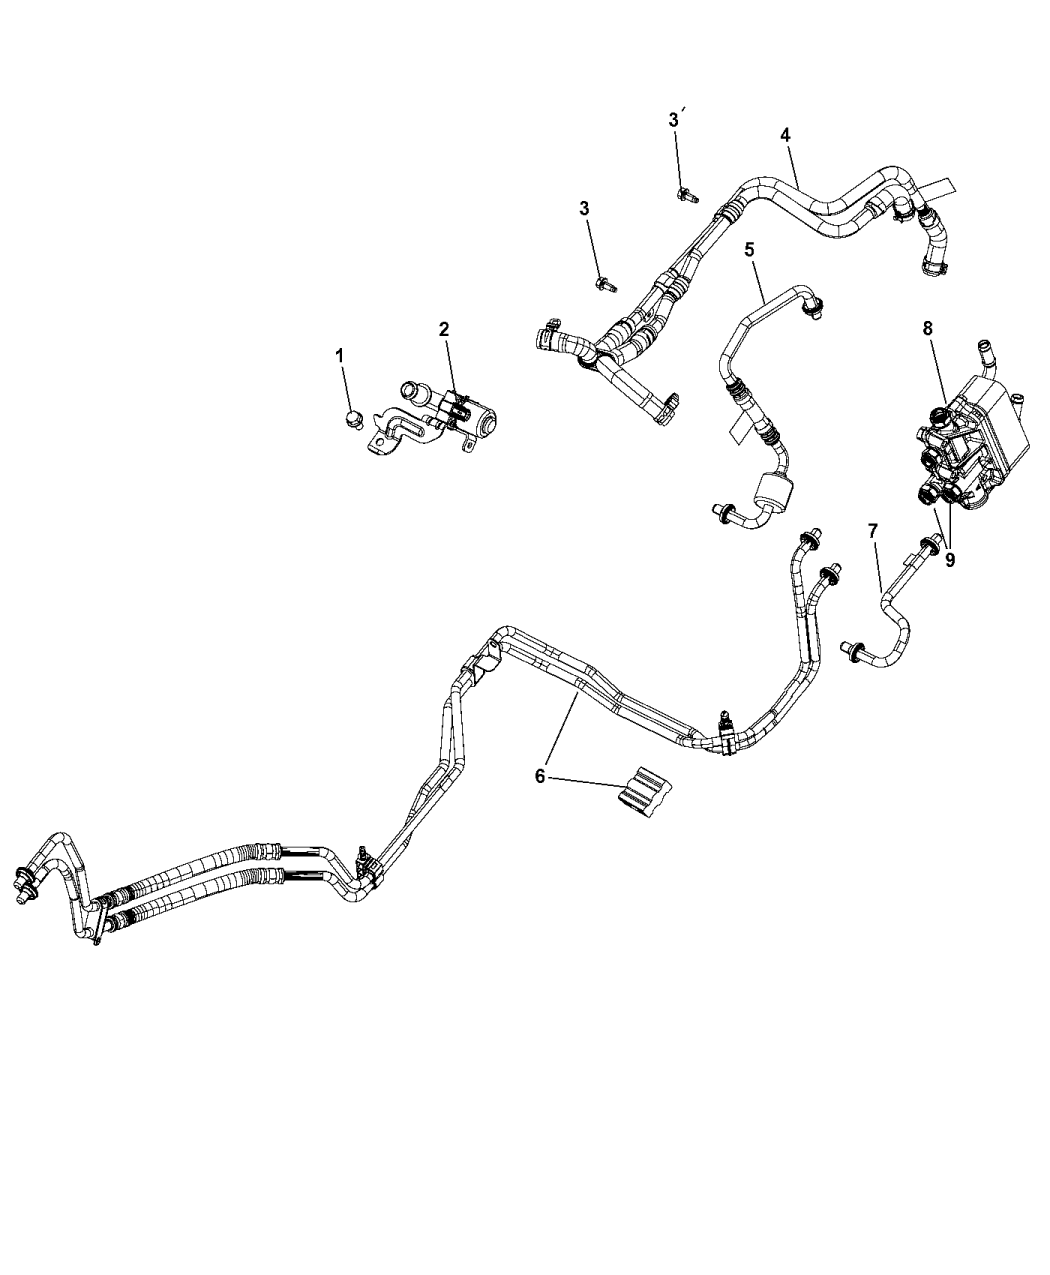 68244058AB - Genuine Mopar TUBE-OIL COOLER PRESSURE AND RET